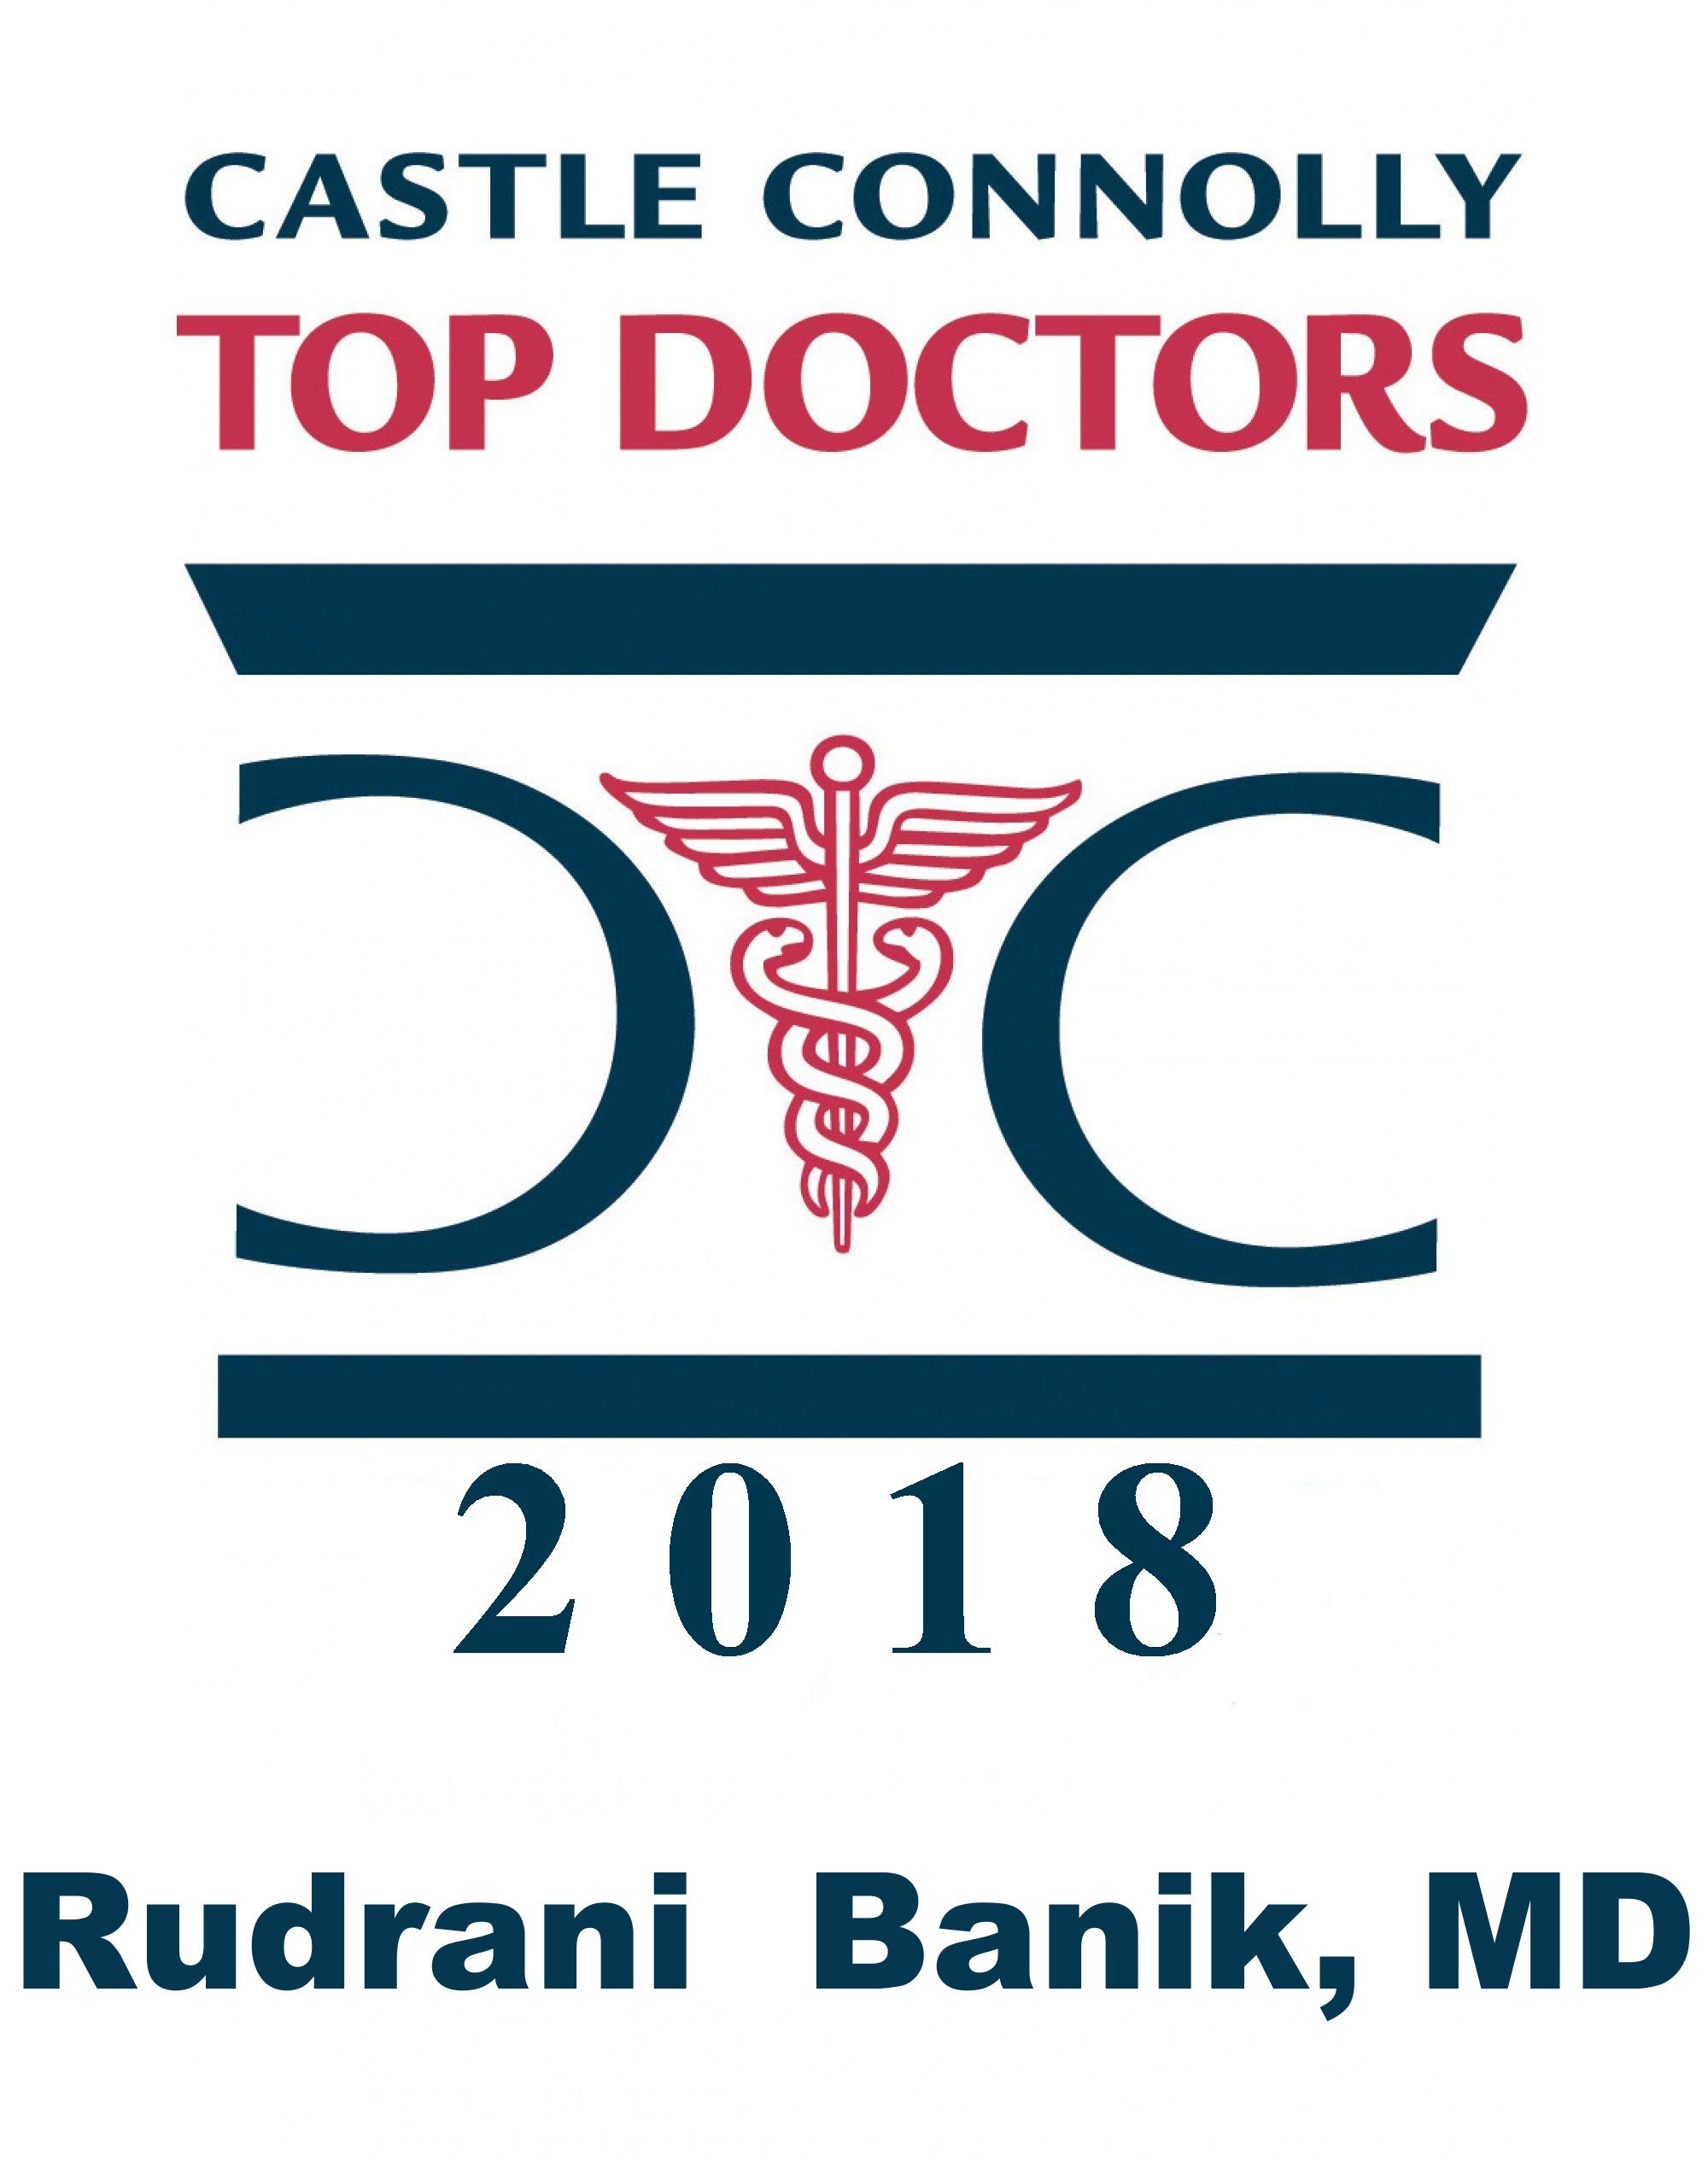 Neuro-Ophthalmology - Rudrani Banik, MD